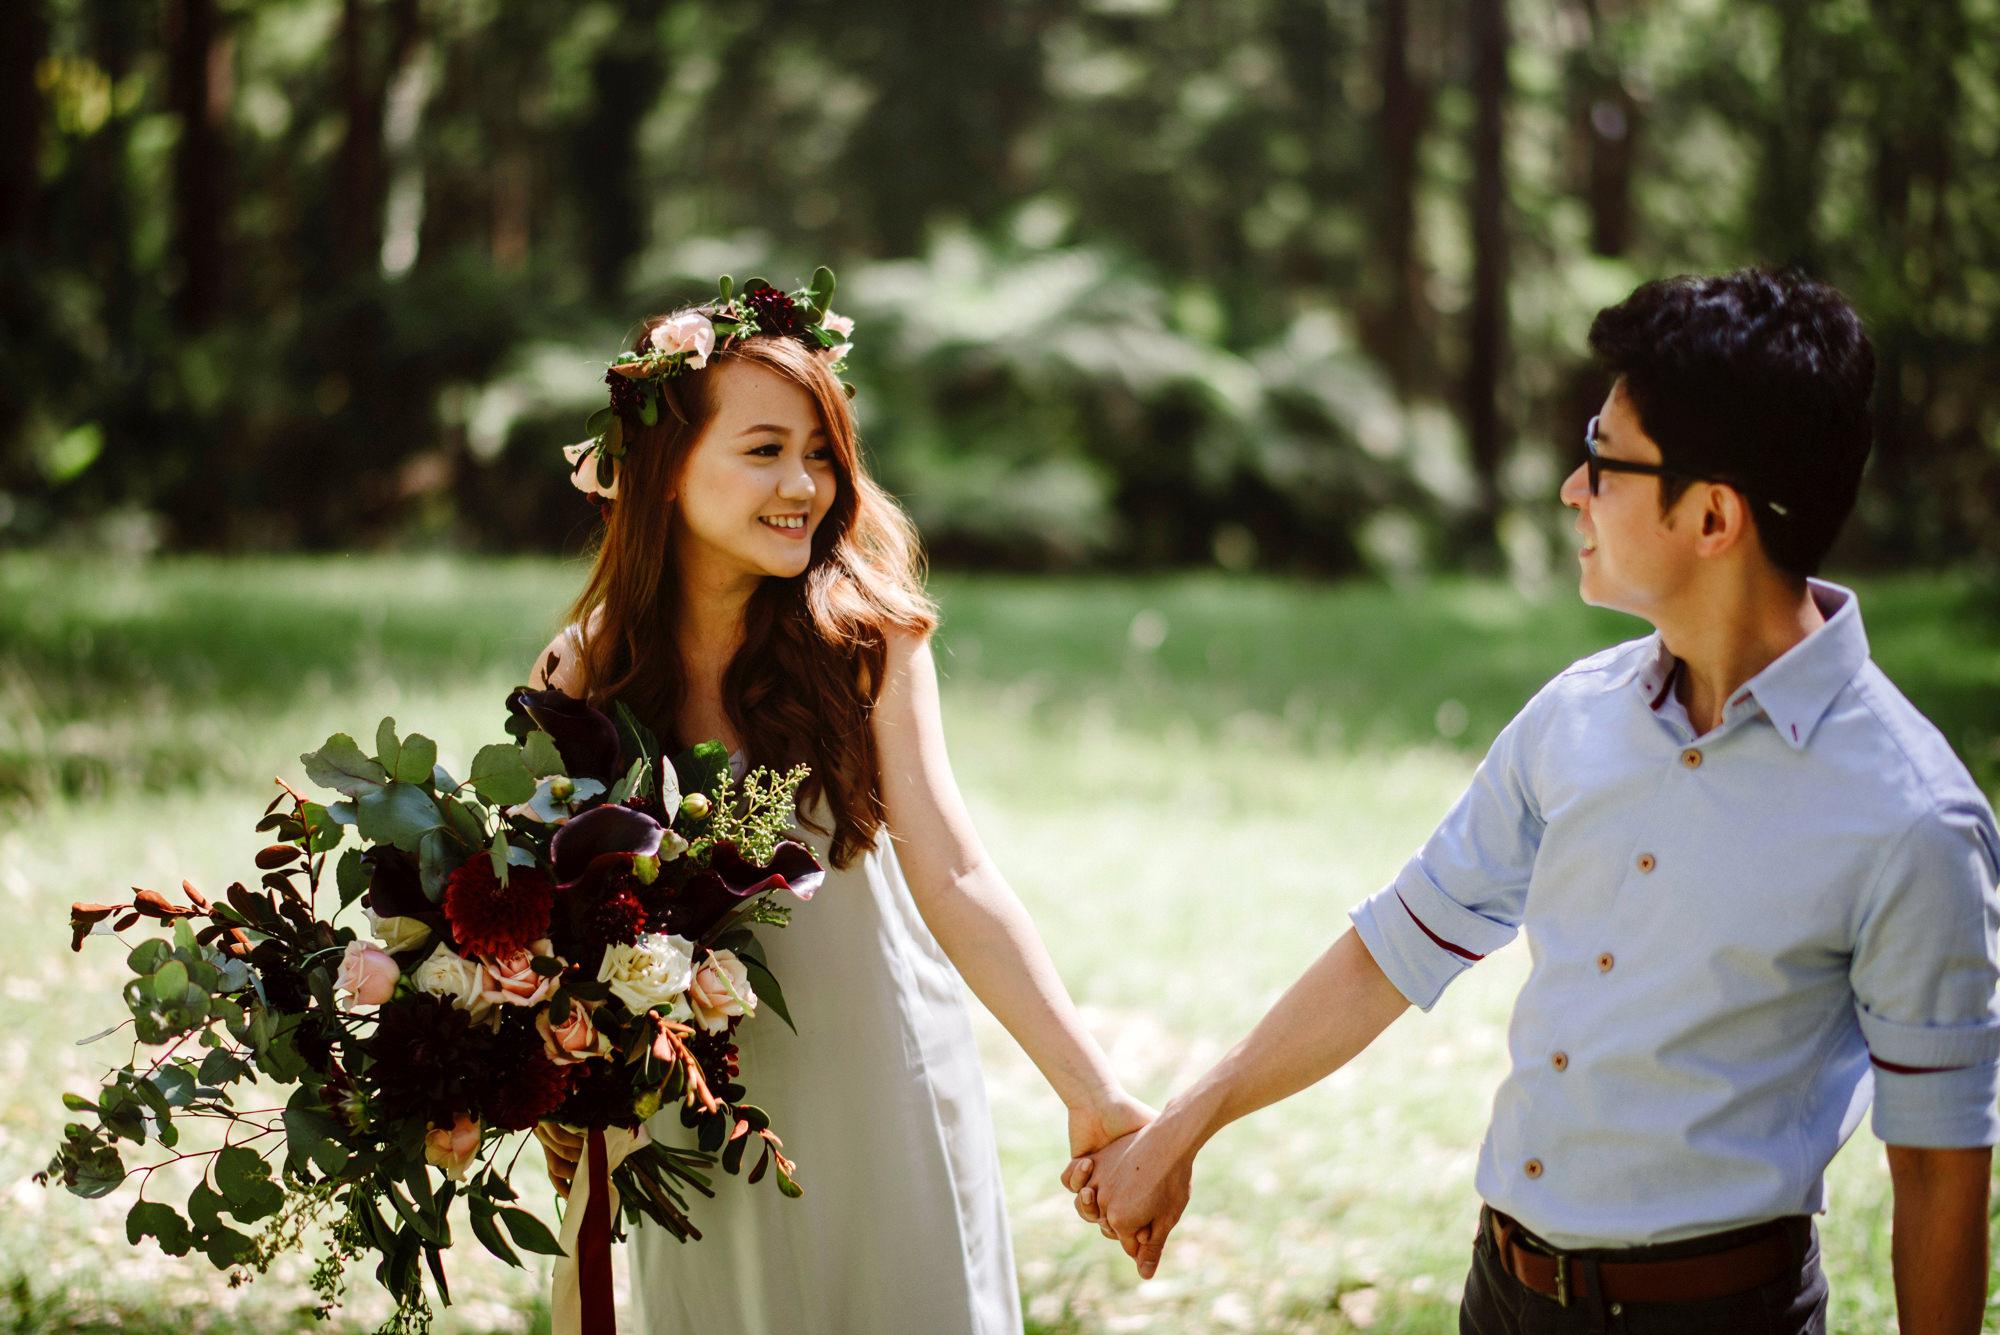 016-melbourne-engagement-wedding-photography